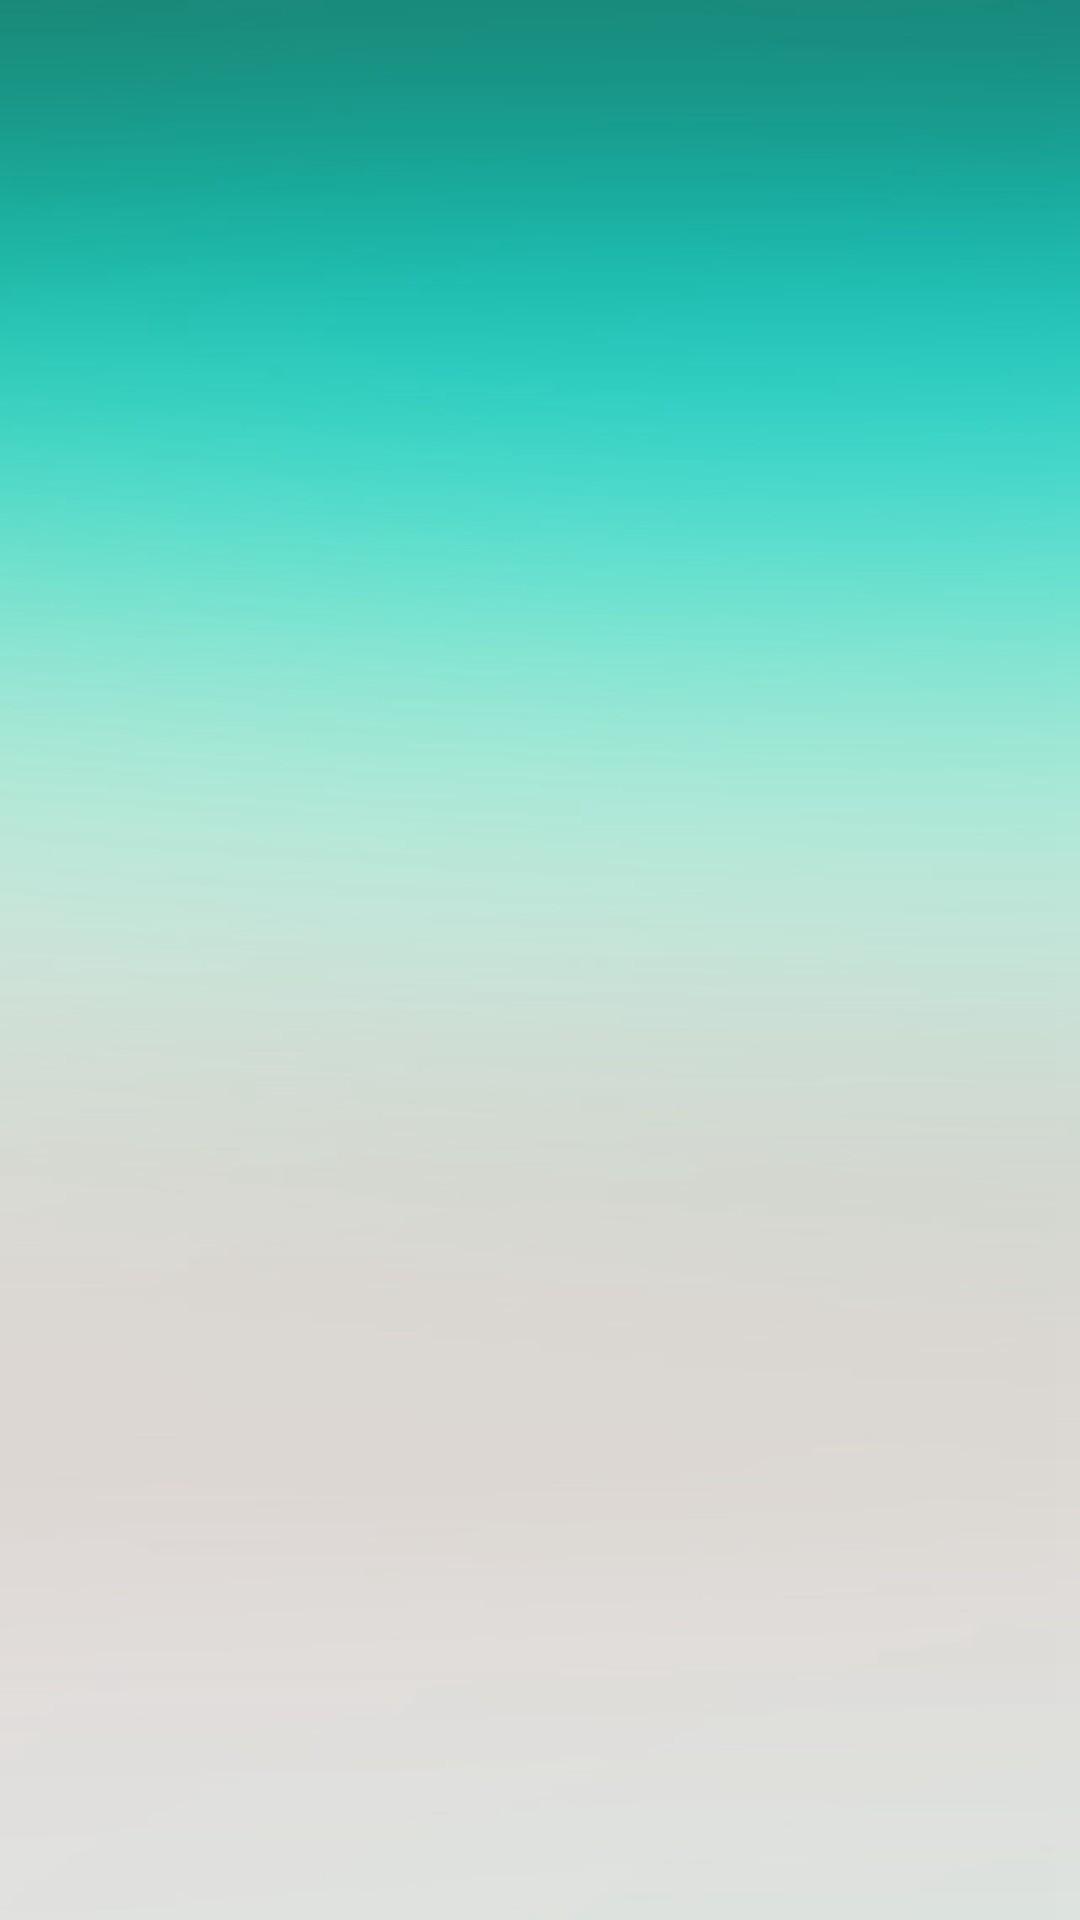 Sky Green Clear White Gradation Blur iPhone 6 wallpaper